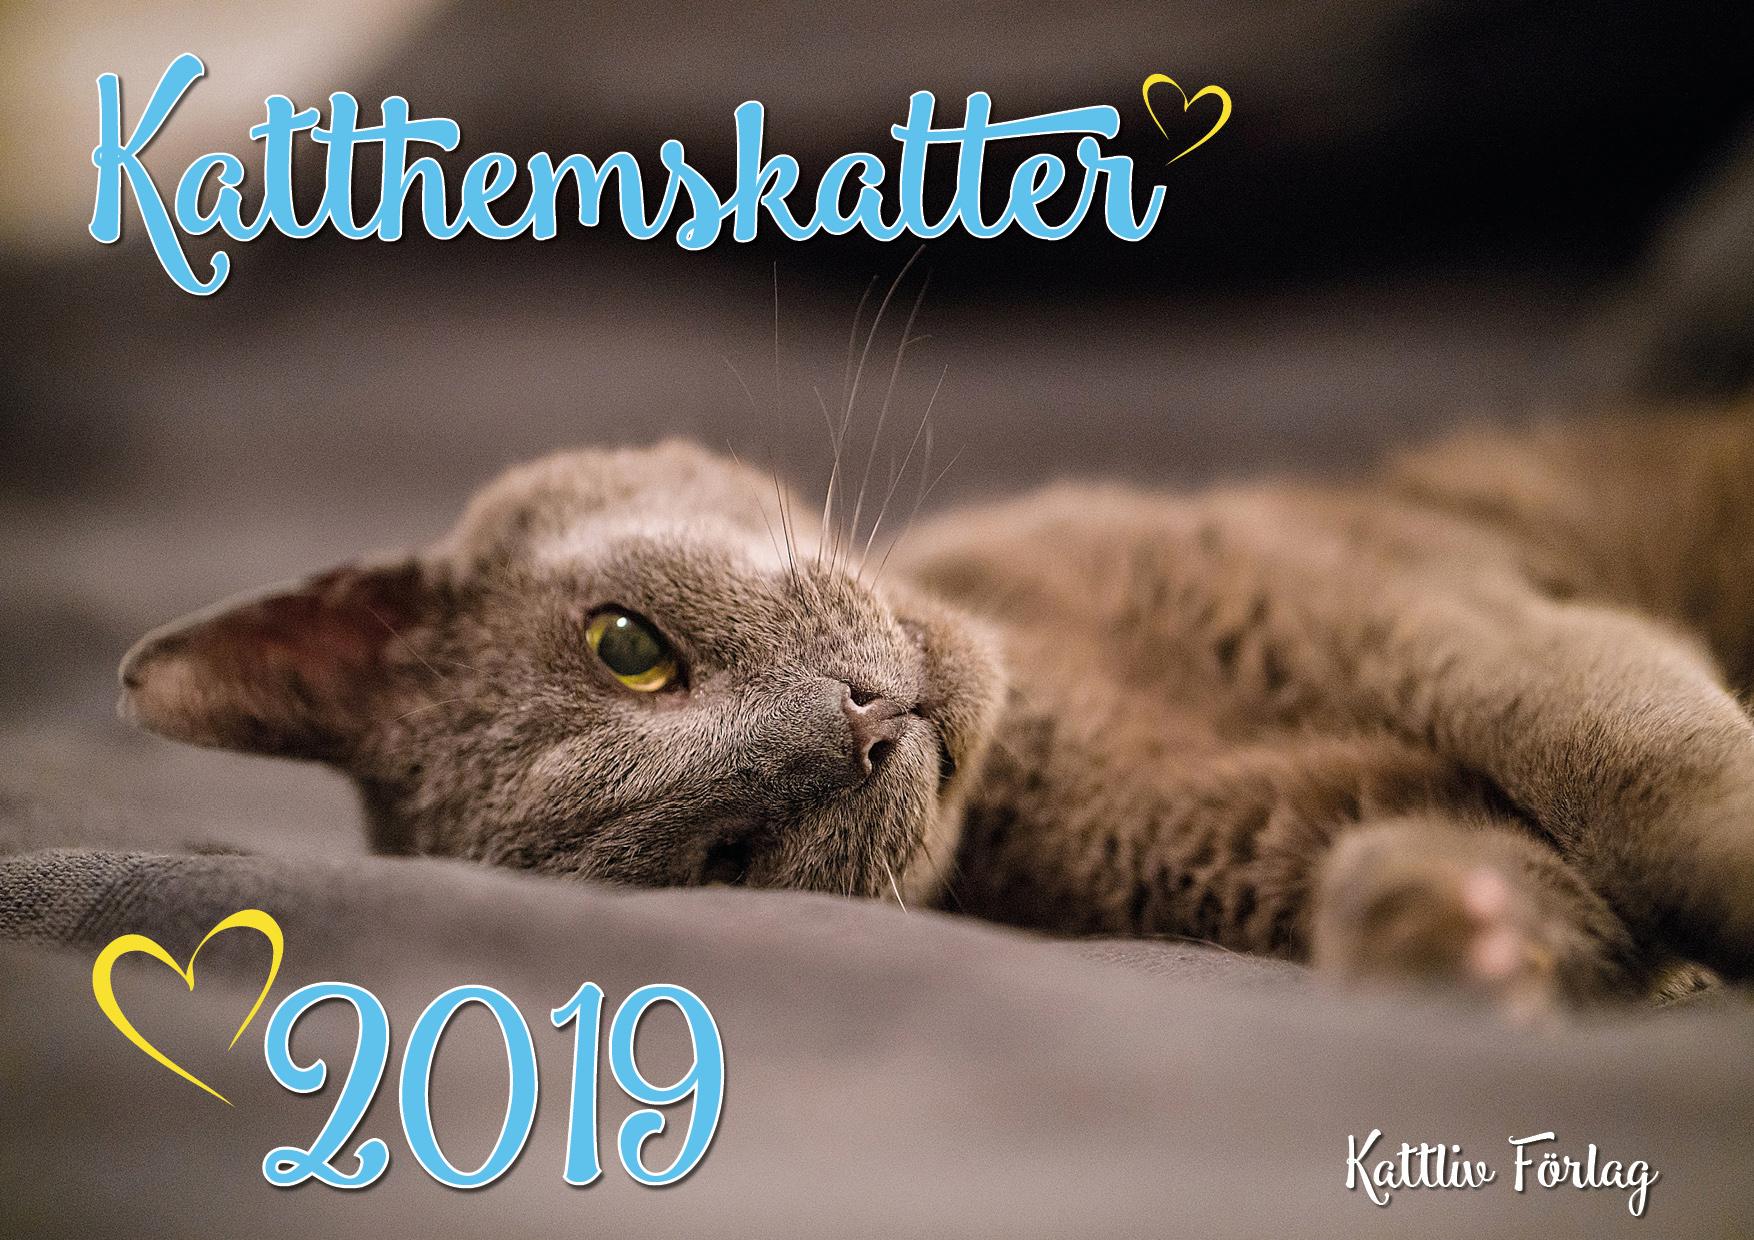 kattkalender_katthemskatter